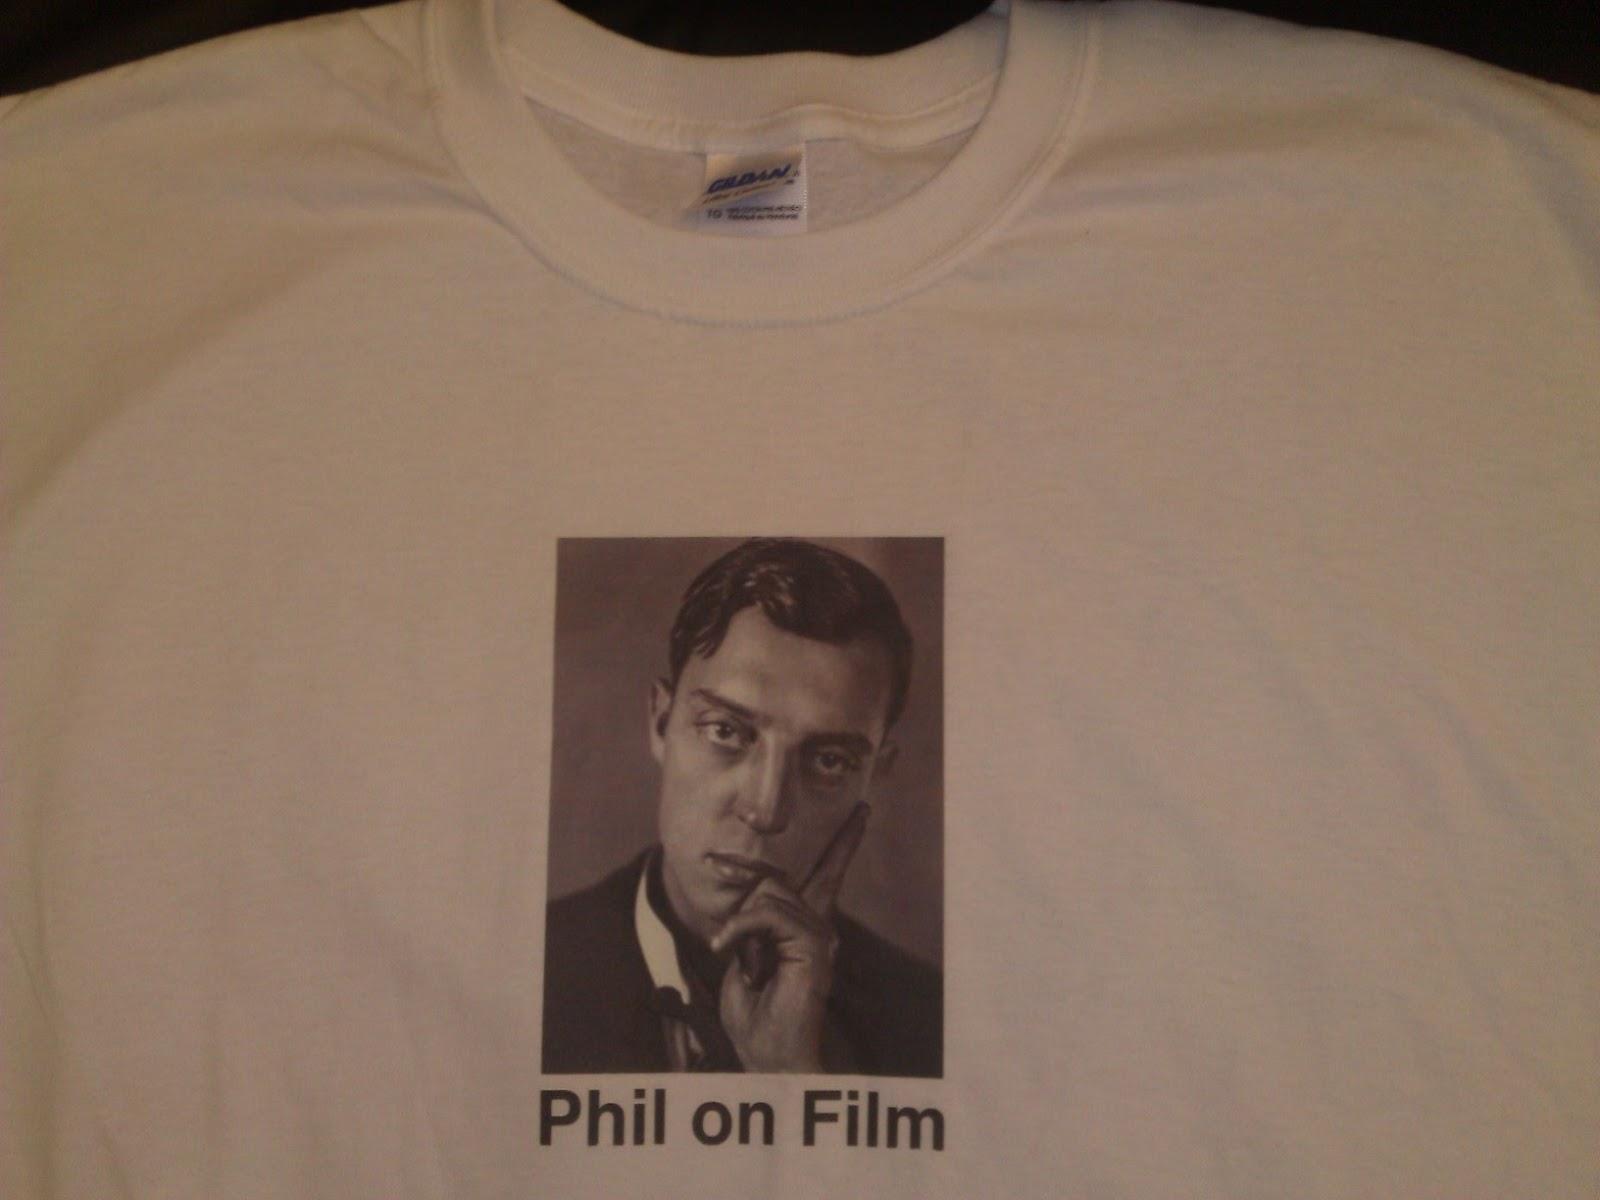 http://3.bp.blogspot.com/-SW-DwZs9XuA/UMzFQlnMD2I/AAAAAAAABxo/wZFXol3tfzQ/s1600/Shirt.jpg